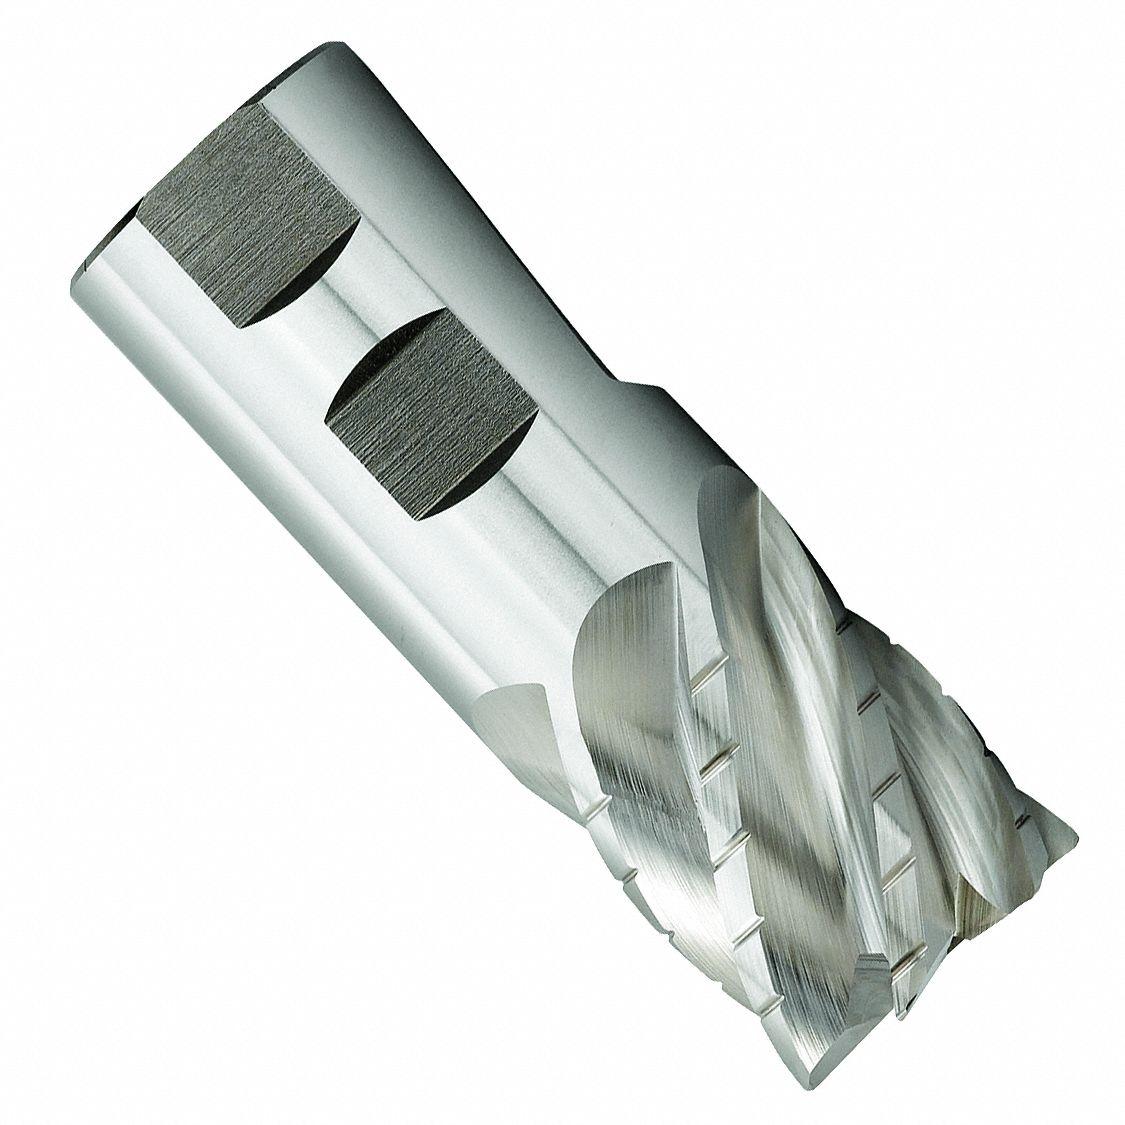 10mm x 10mm x 25mm x 72mm 3 Flute 1.0mm Radius Carbide End Mill-ZrN